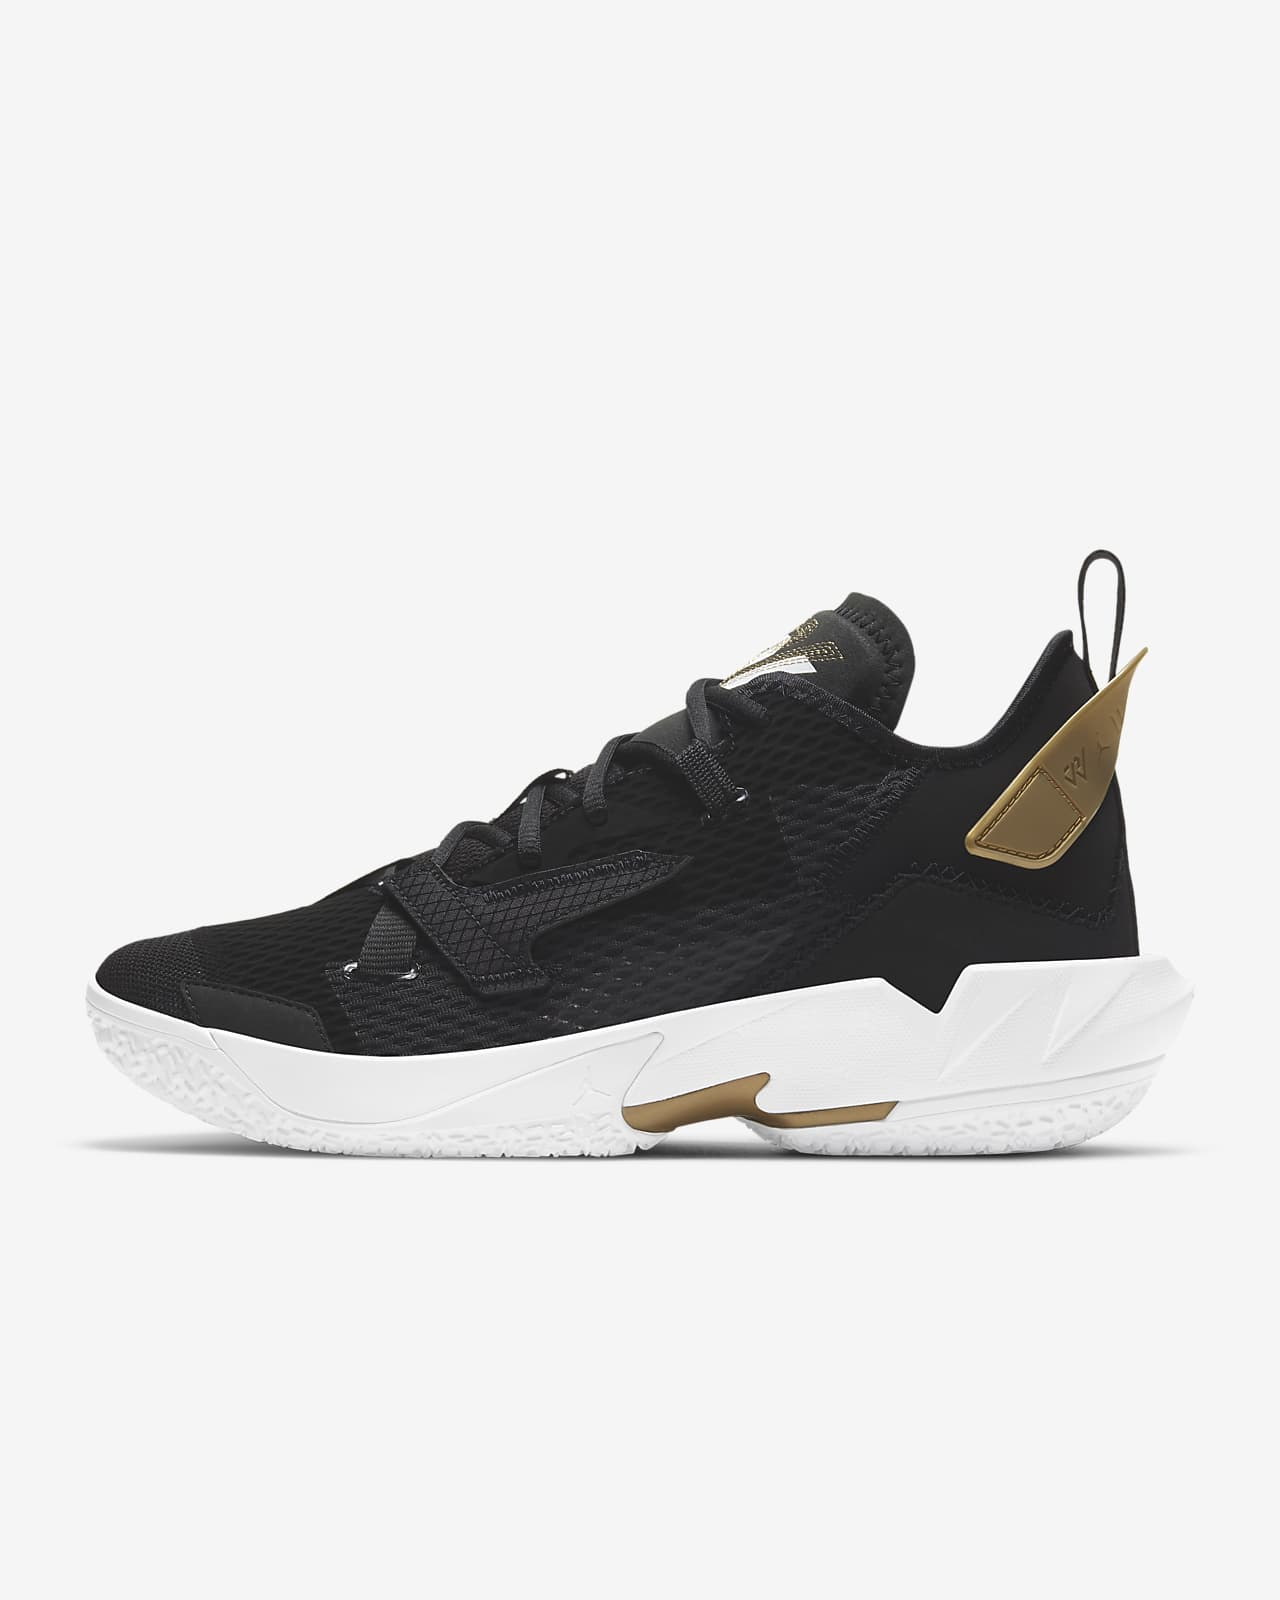 Jordan 'Why Not?'Zer0.4 'Family' Basketball Shoe